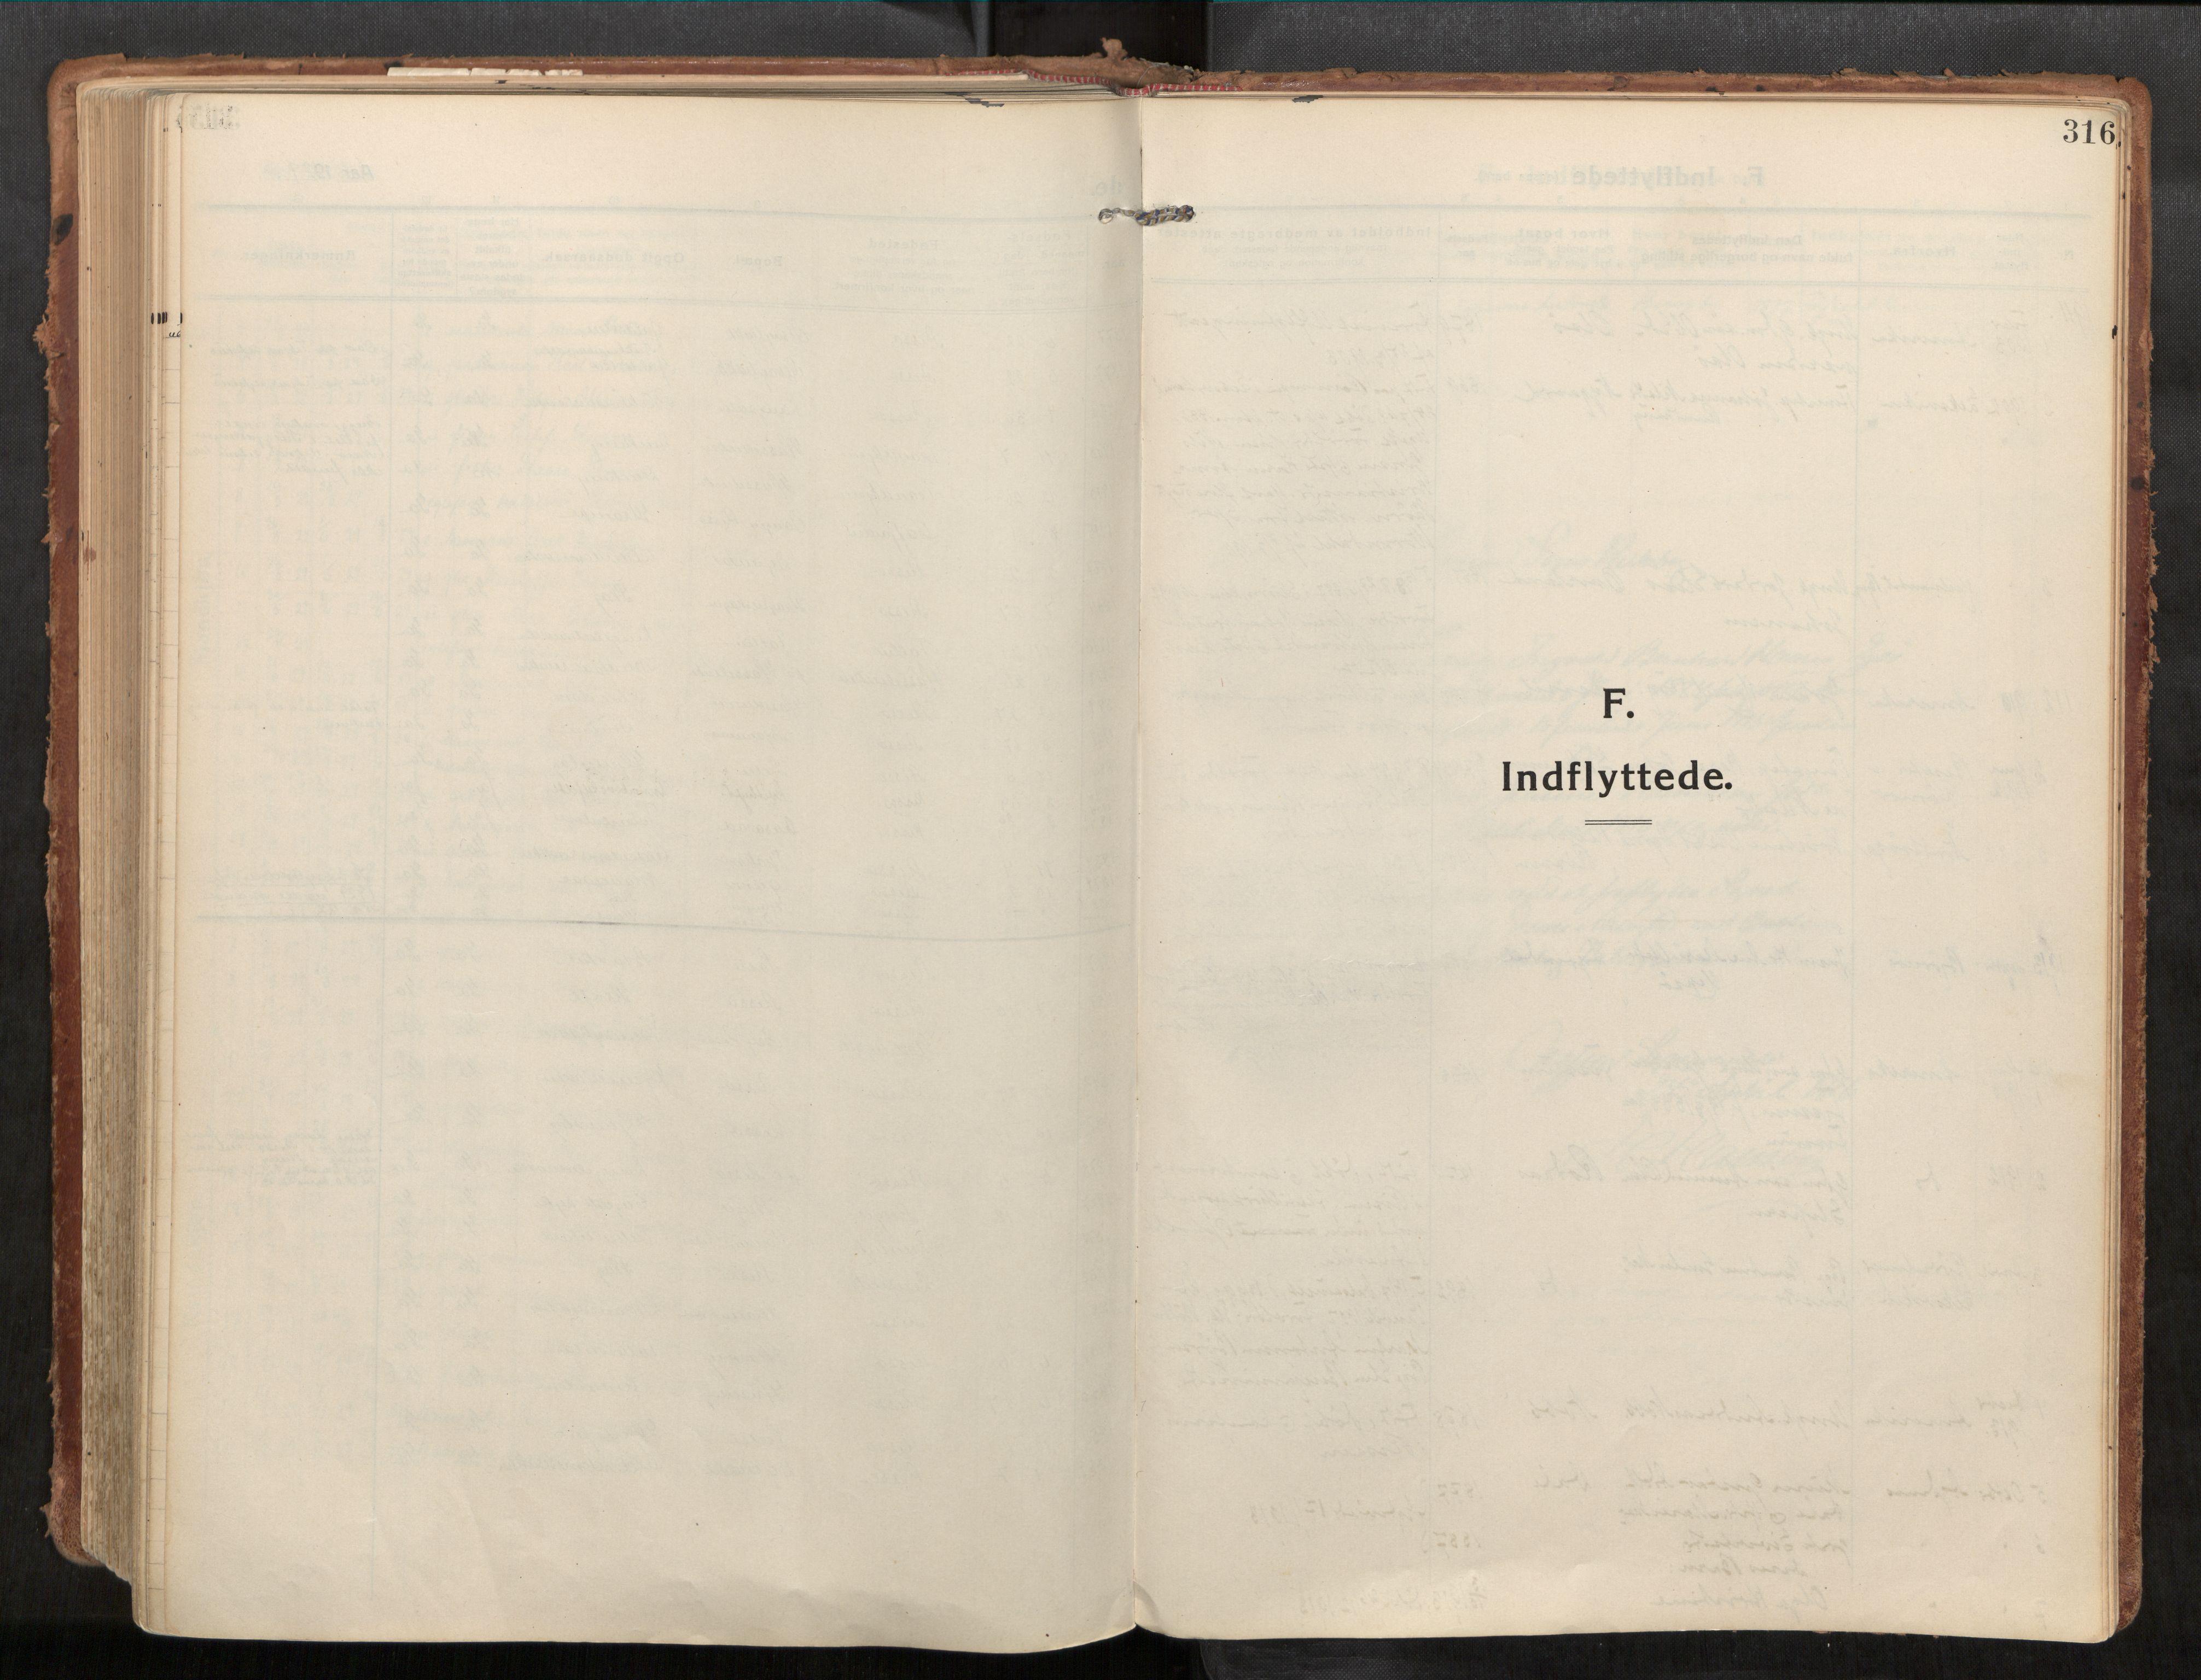 SAT, Stadsbygd sokneprestkontor, I/I1/I1a/L0001: Parish register (official) no. 1, 1911-1929, p. 316